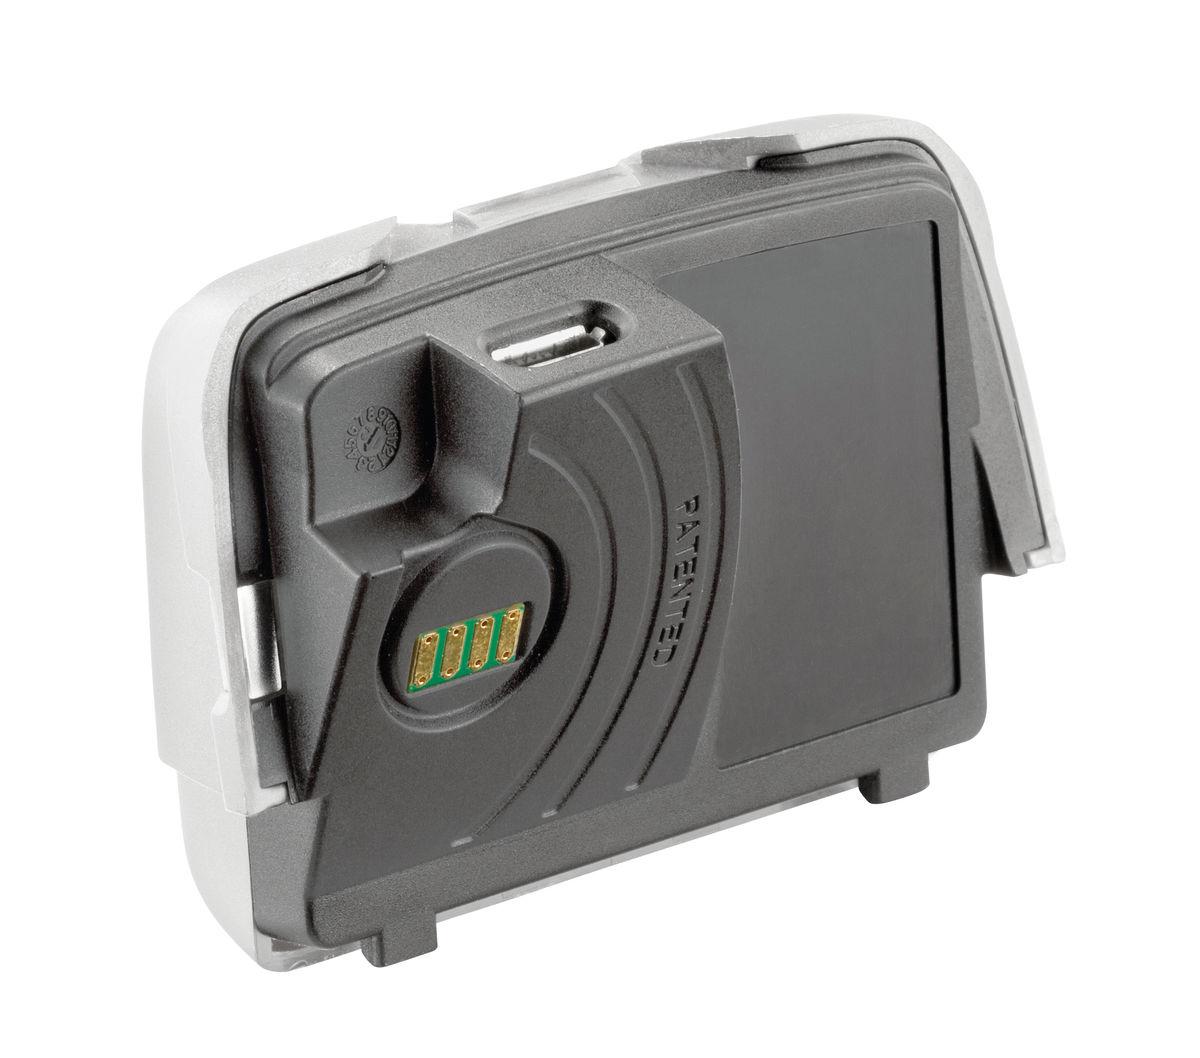 Petzl Accu Reactik / Reactik compatible Tikka R+ / Tikka RXP - Batterie rechargeable